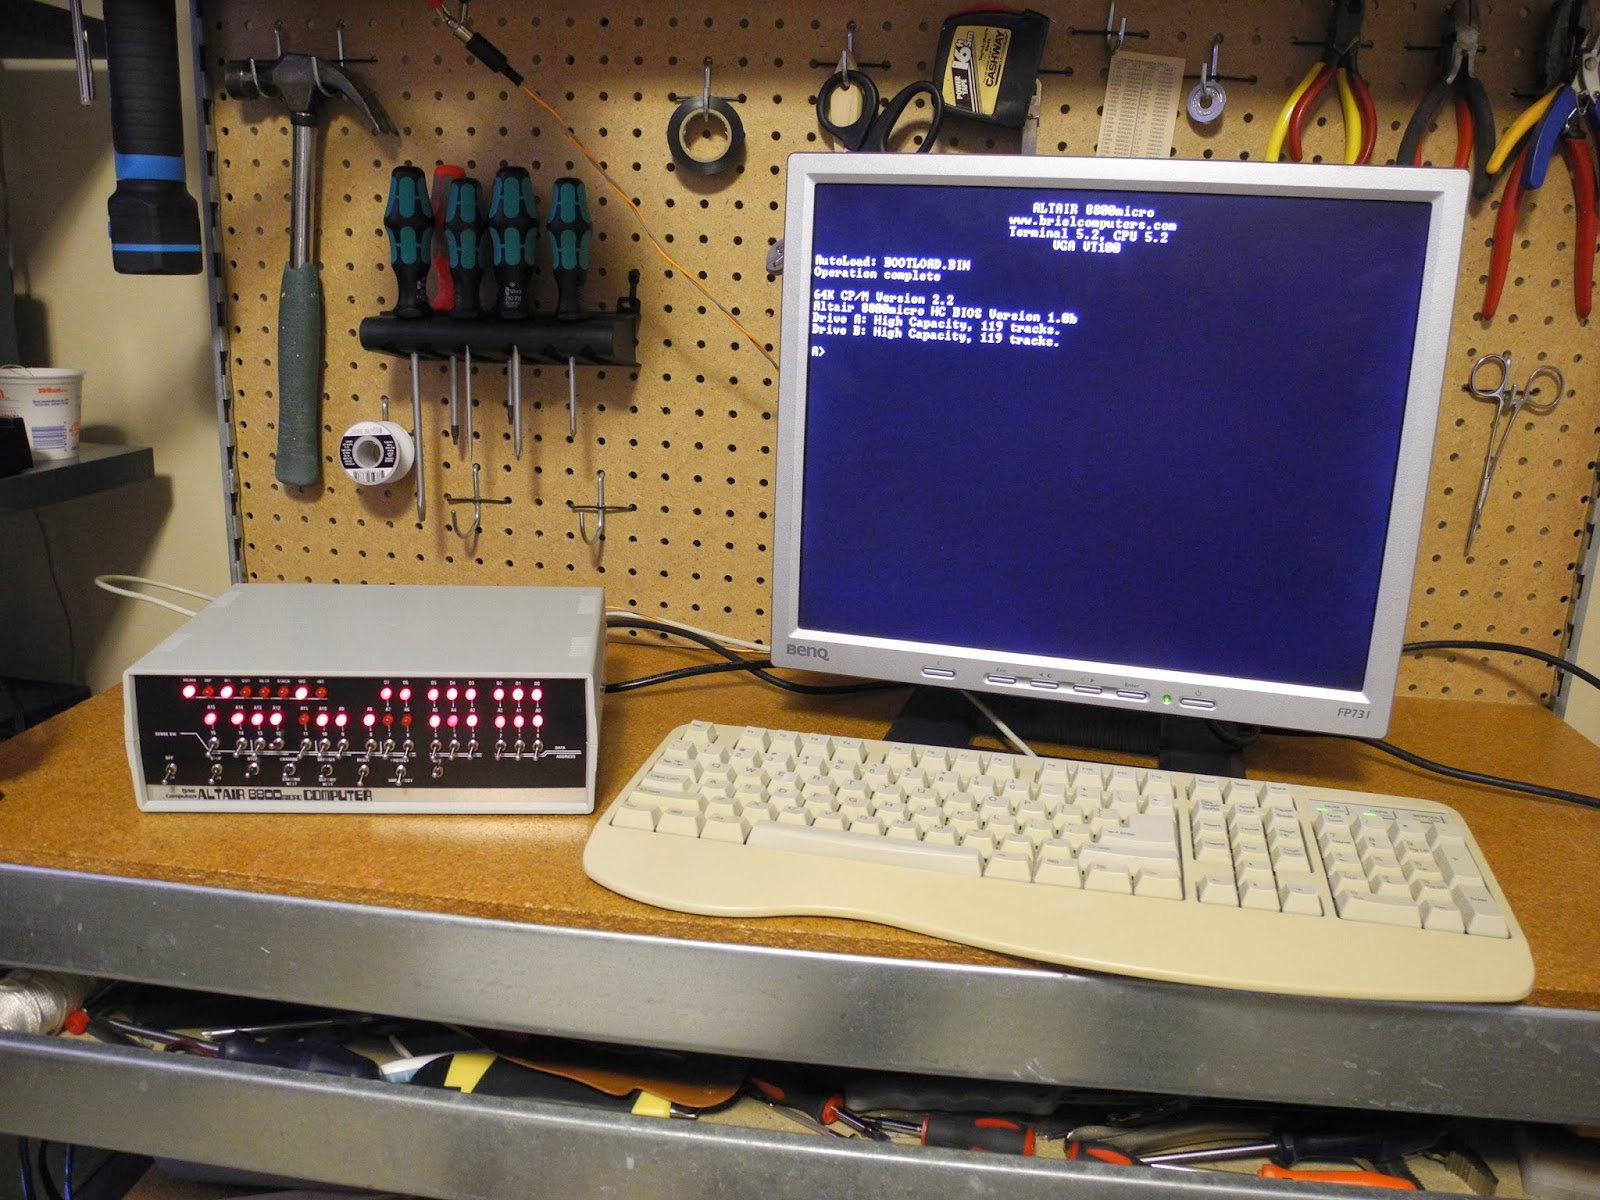 Jeff Tranter S Blog The Briel Altair 8800 Replica Kit